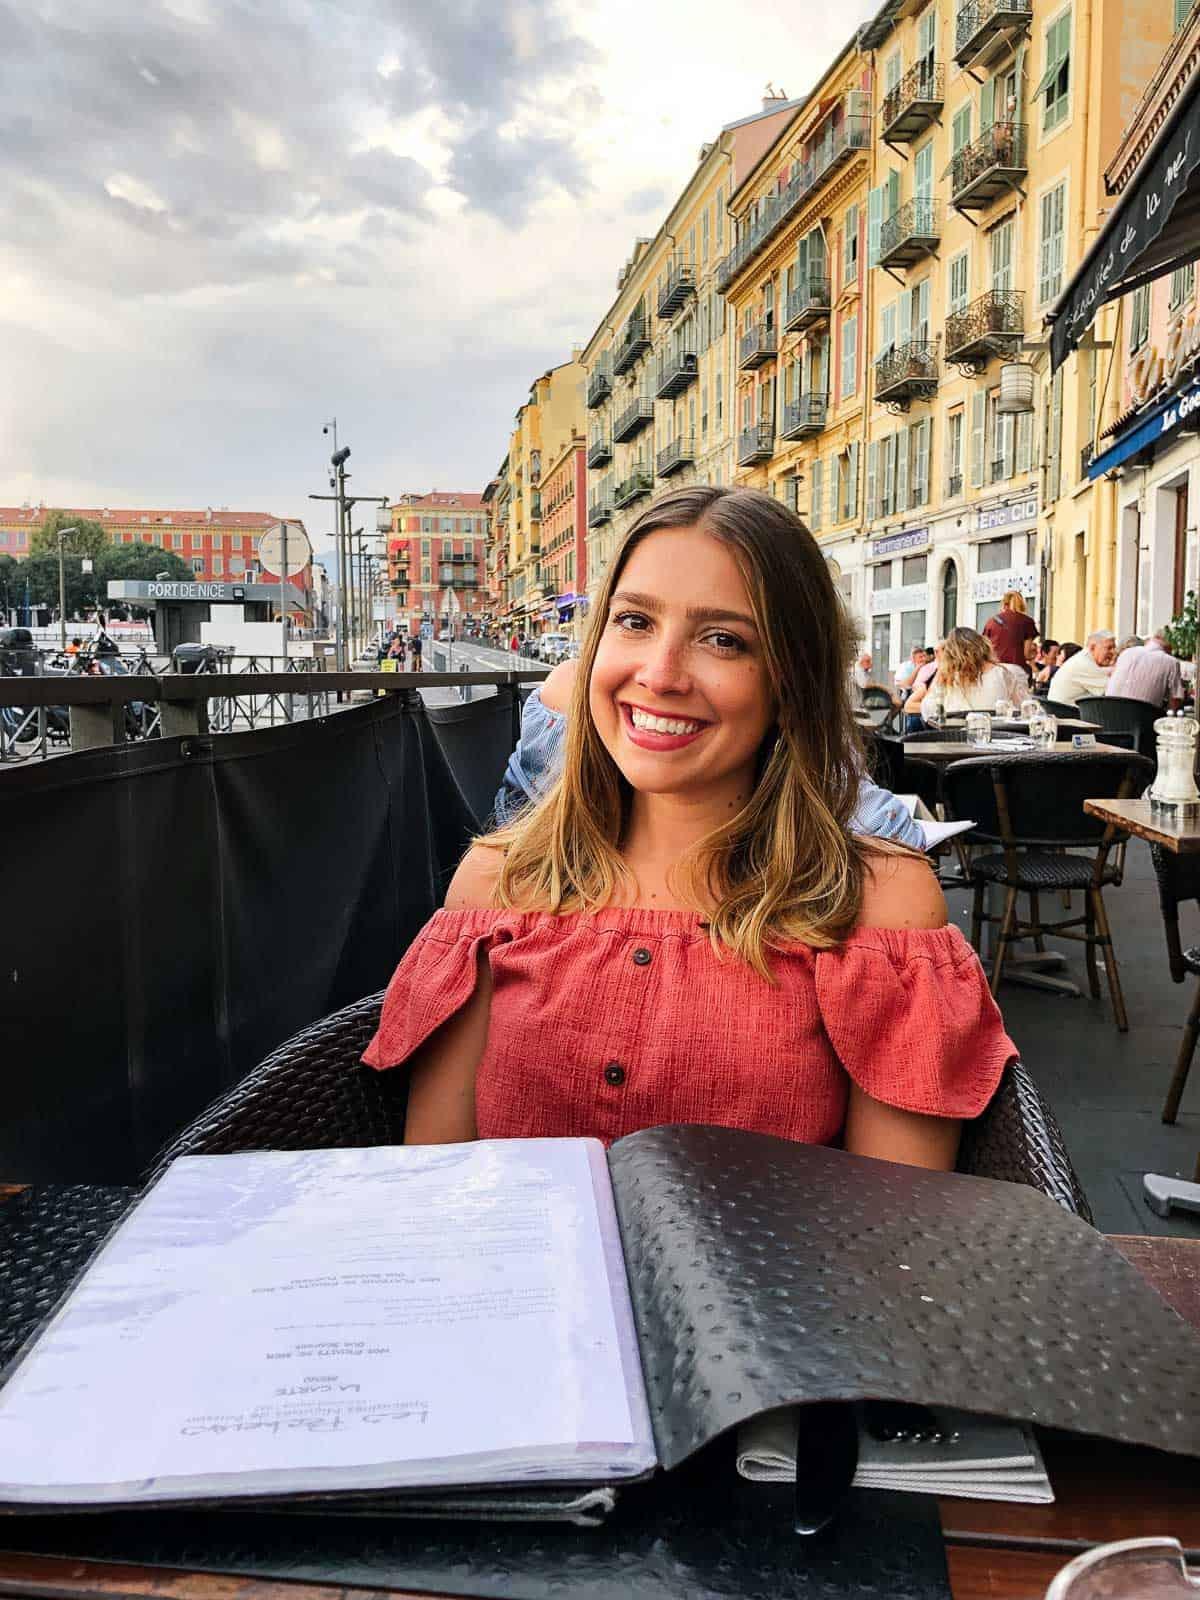 Kara visiting a restaurant in France